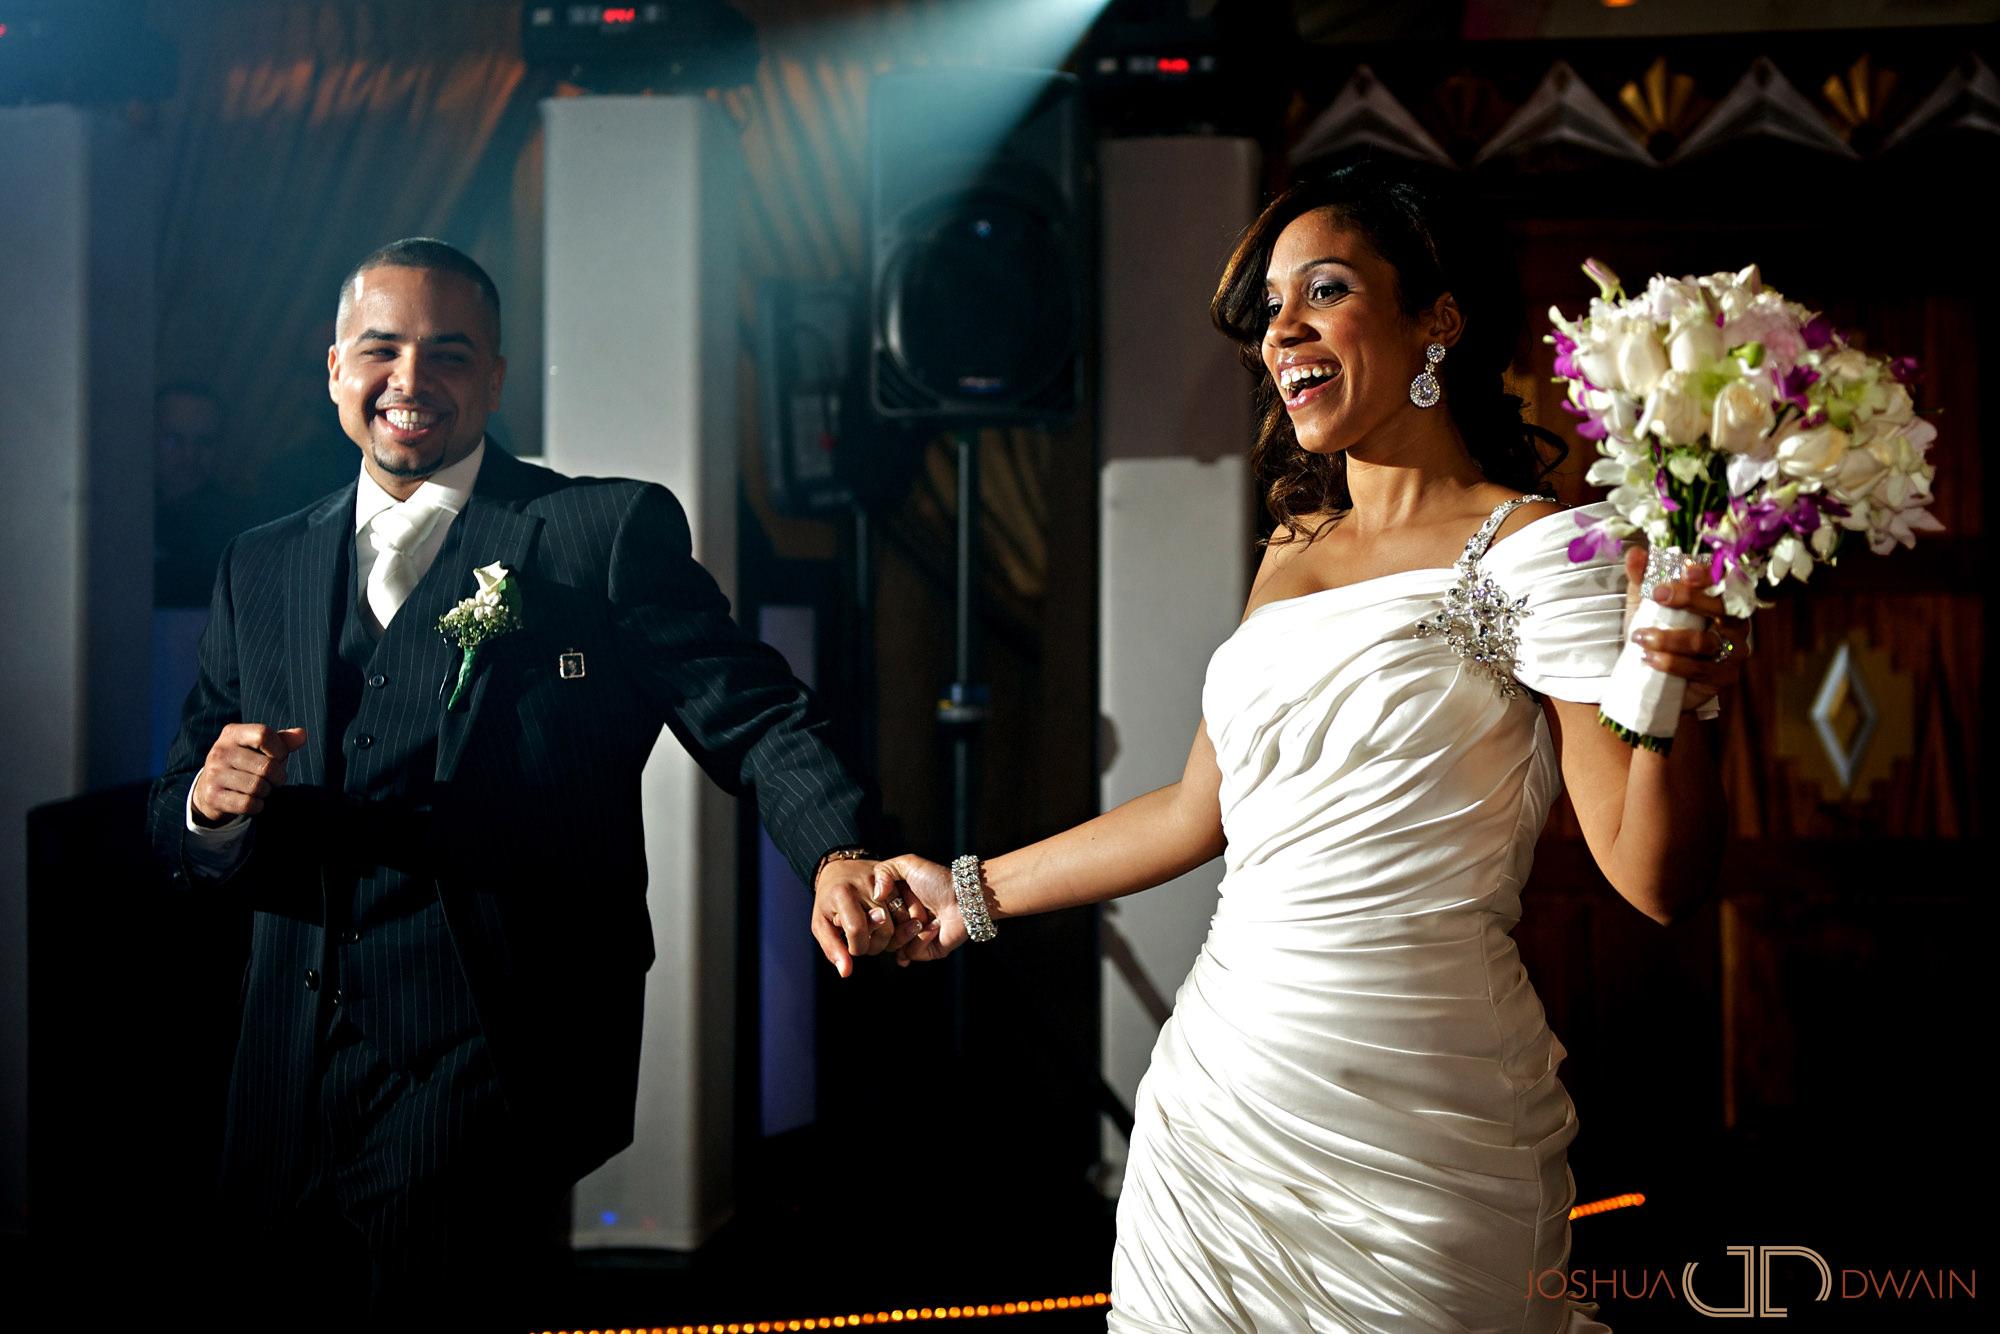 carolina-hector-027-chateau-briandlong-island-new-york-wedding-photographer-joshua-dwain-2011-05-13_ch_0706